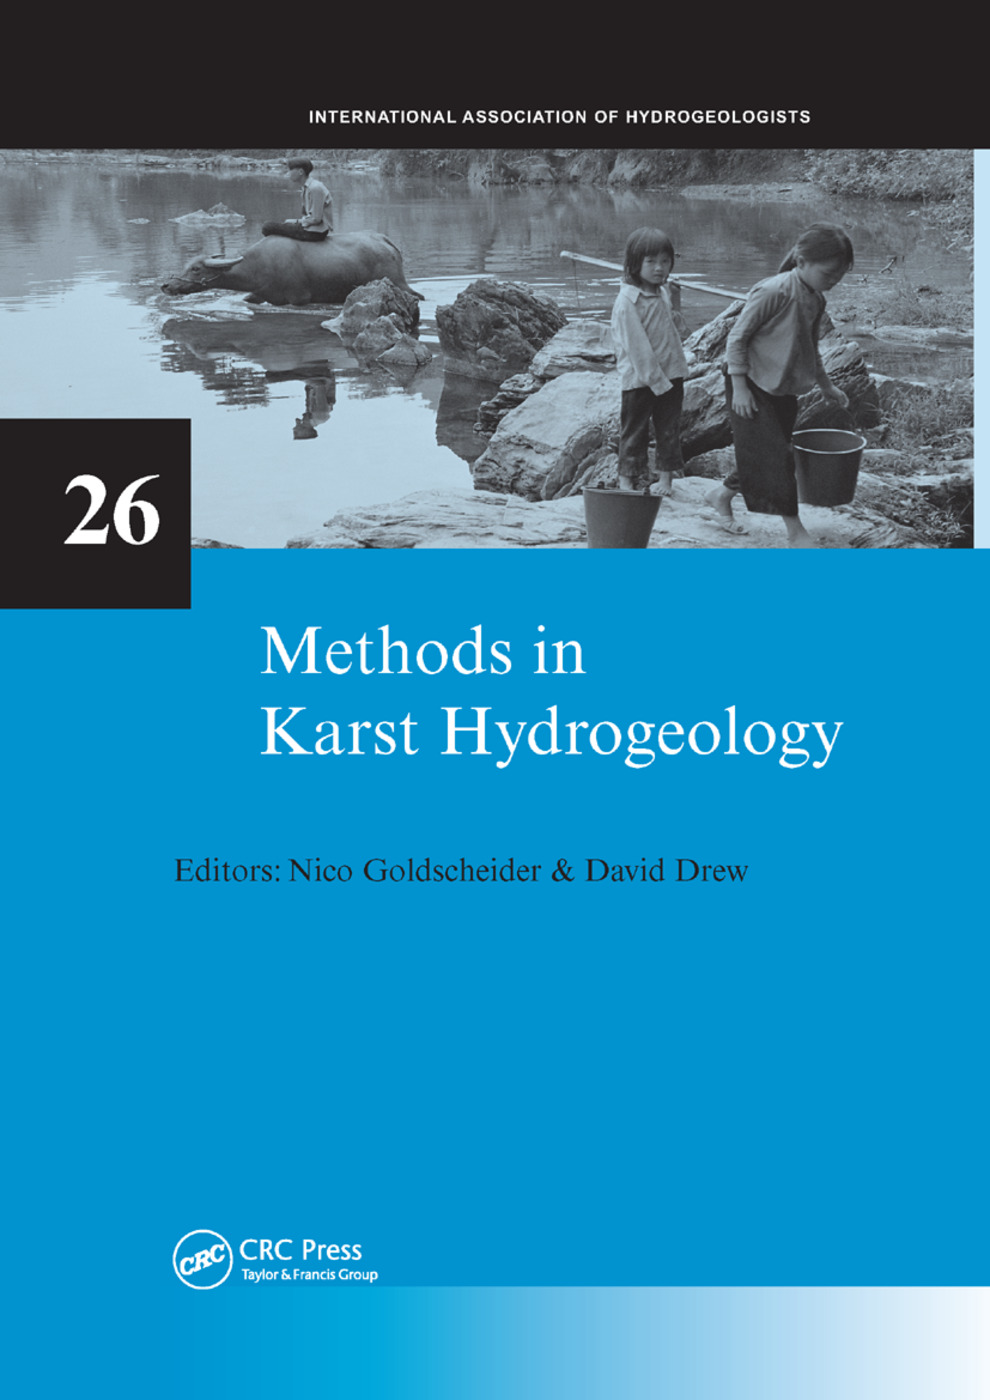 Methods in Karst Hydrogeology